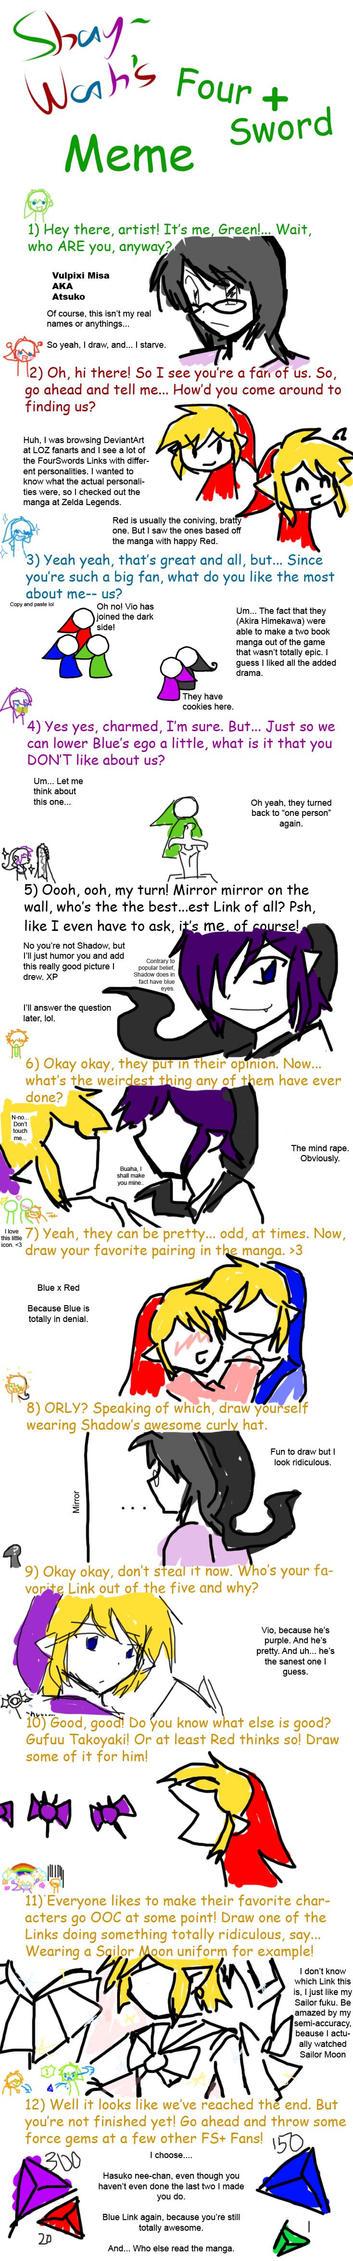 ShayWah's Four Swords+ Meme by Vulpixi-Misa